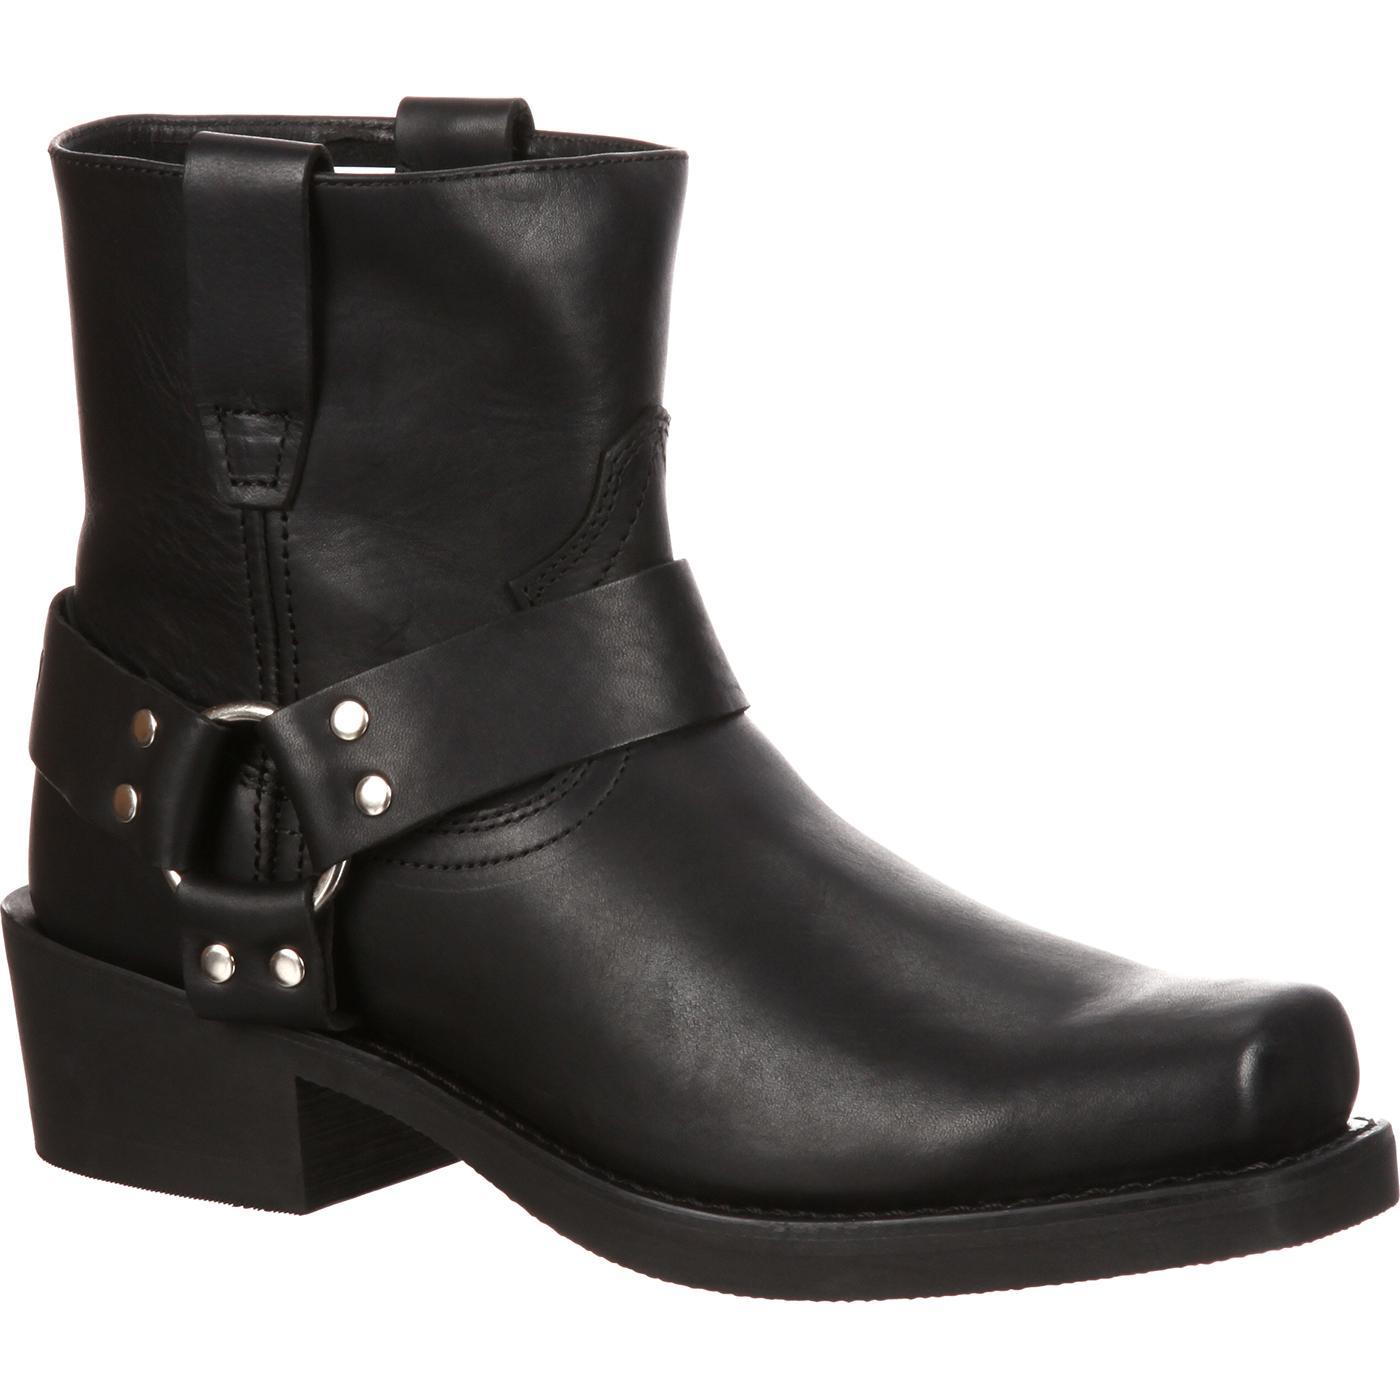 Durango Boots #DB710 - Men's Black Leather Harness Boots